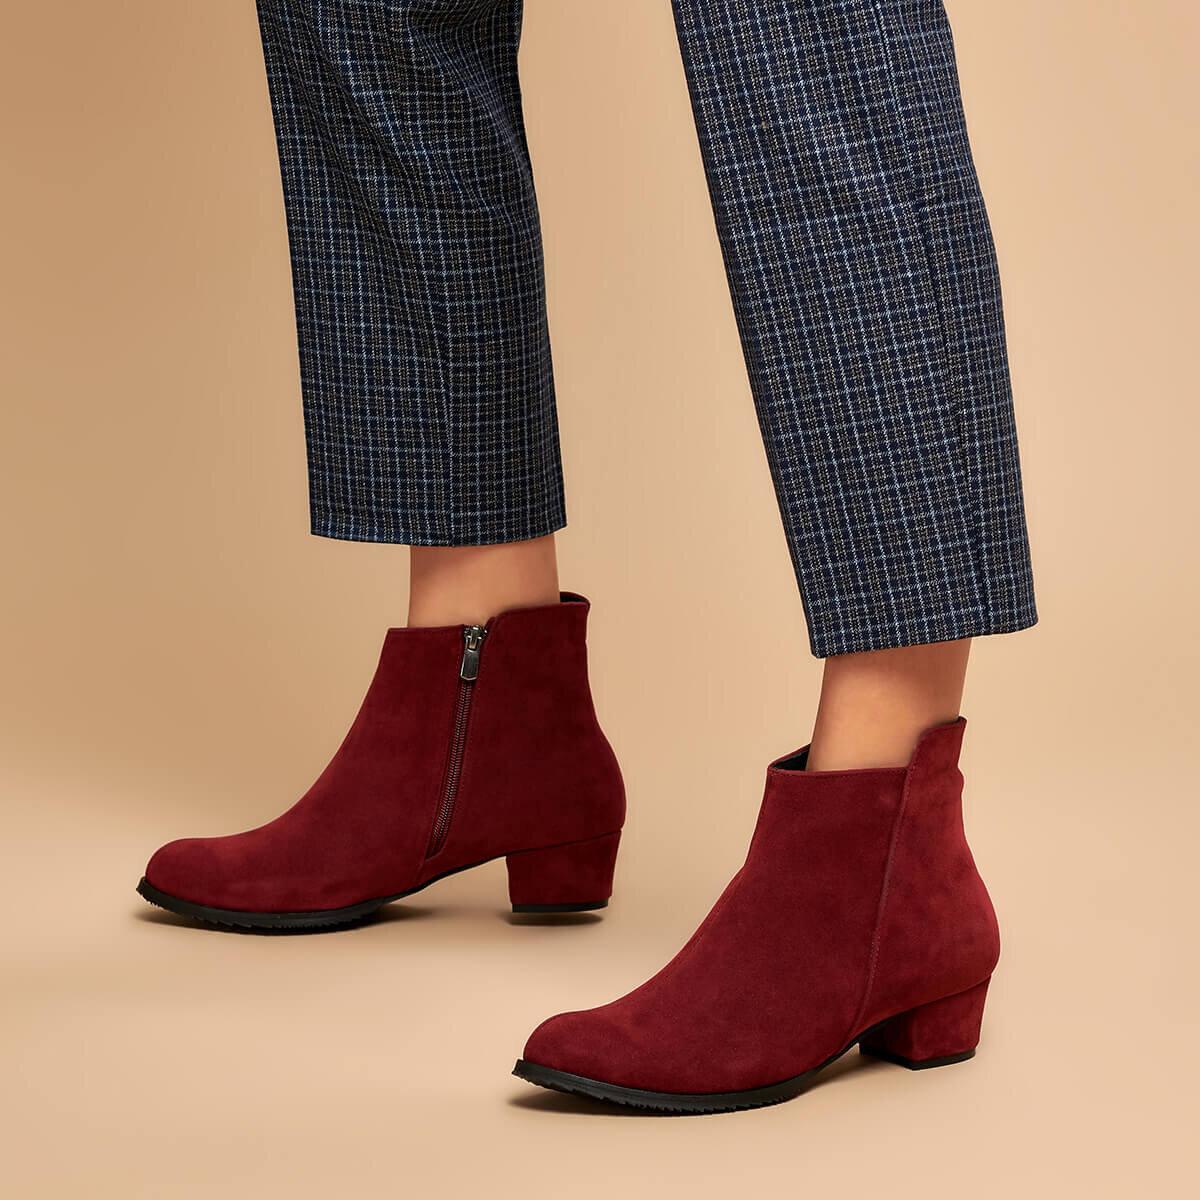 FLO GÜZAY31Z SKIN Maroon Women 'S Boots BUTIGO